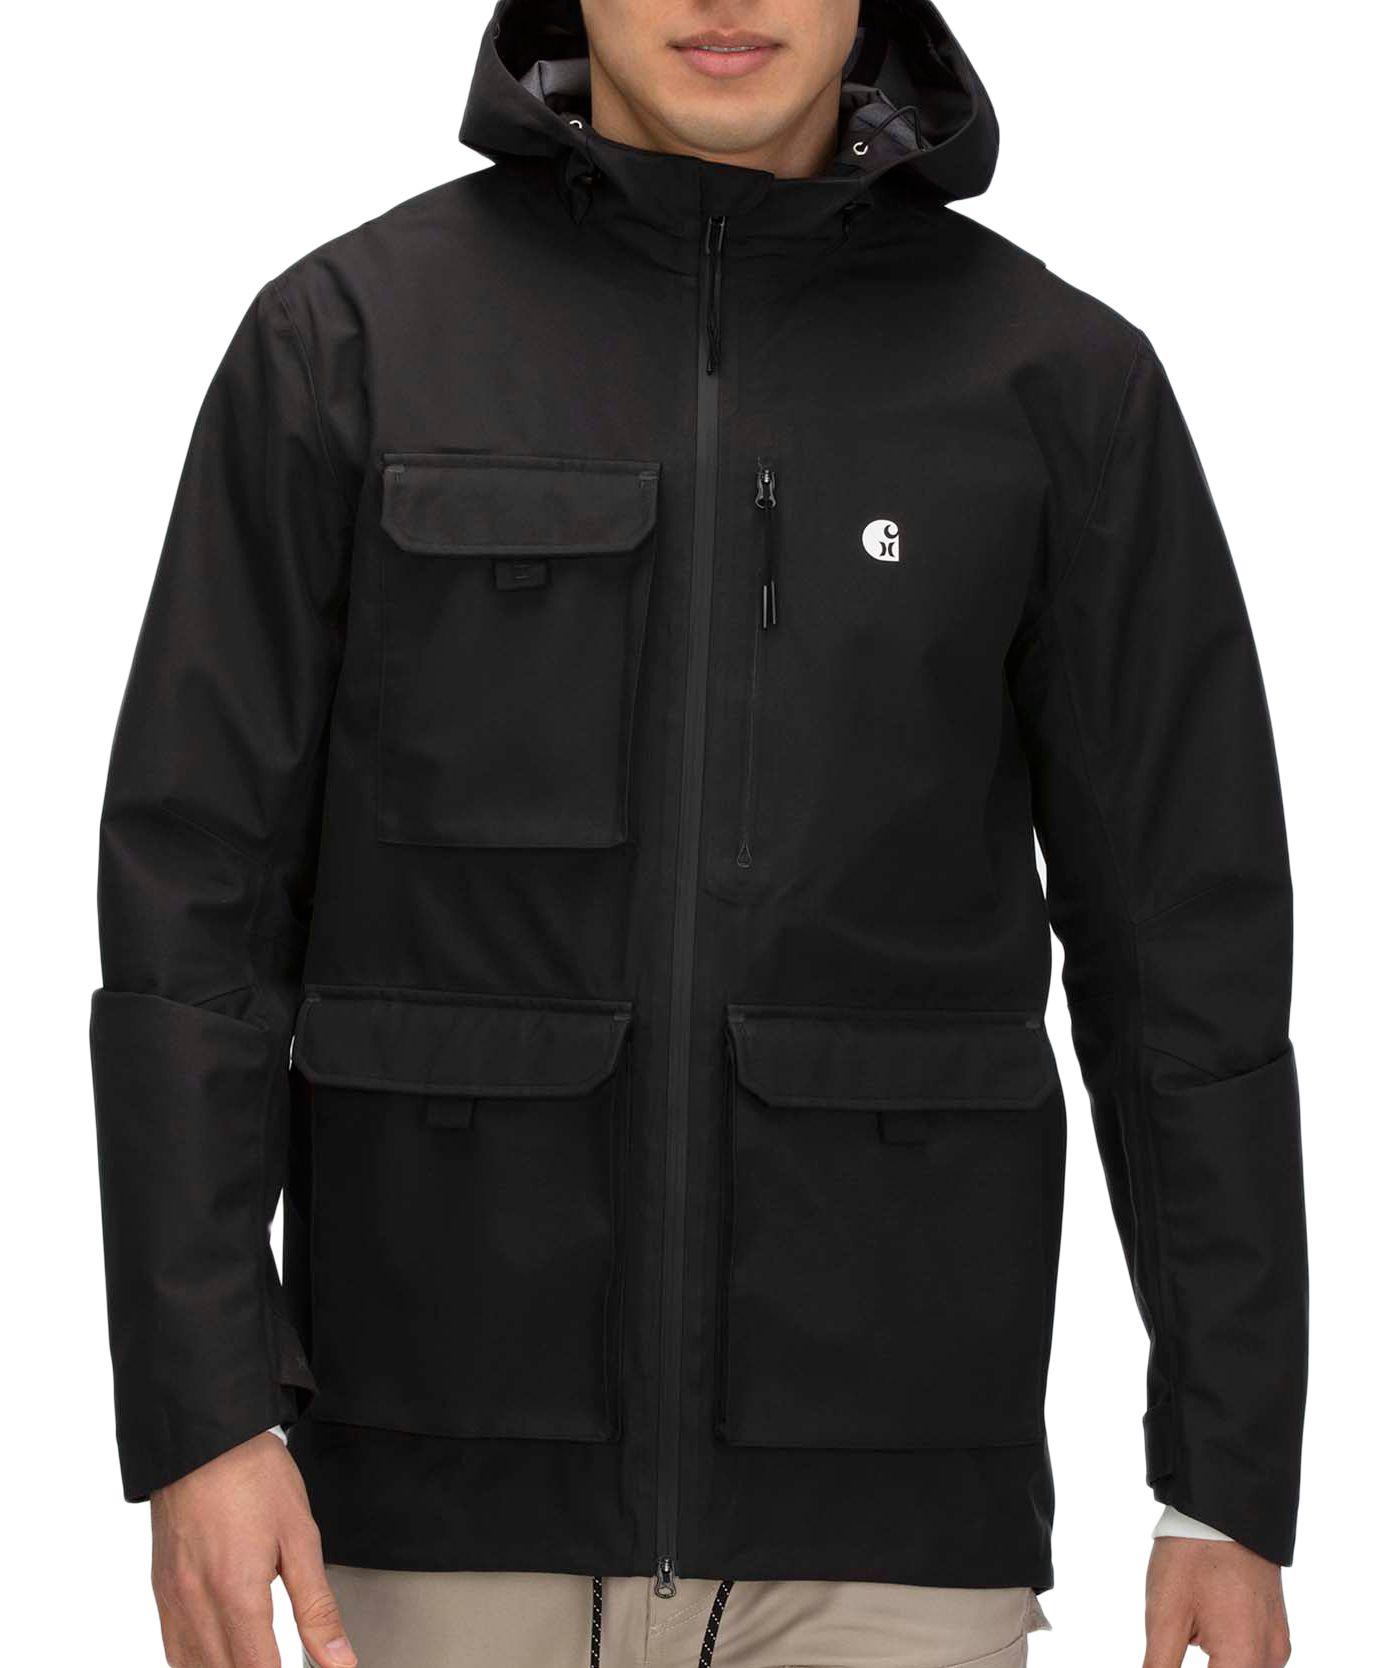 Hurley Men's Carhartt Defender Jacket